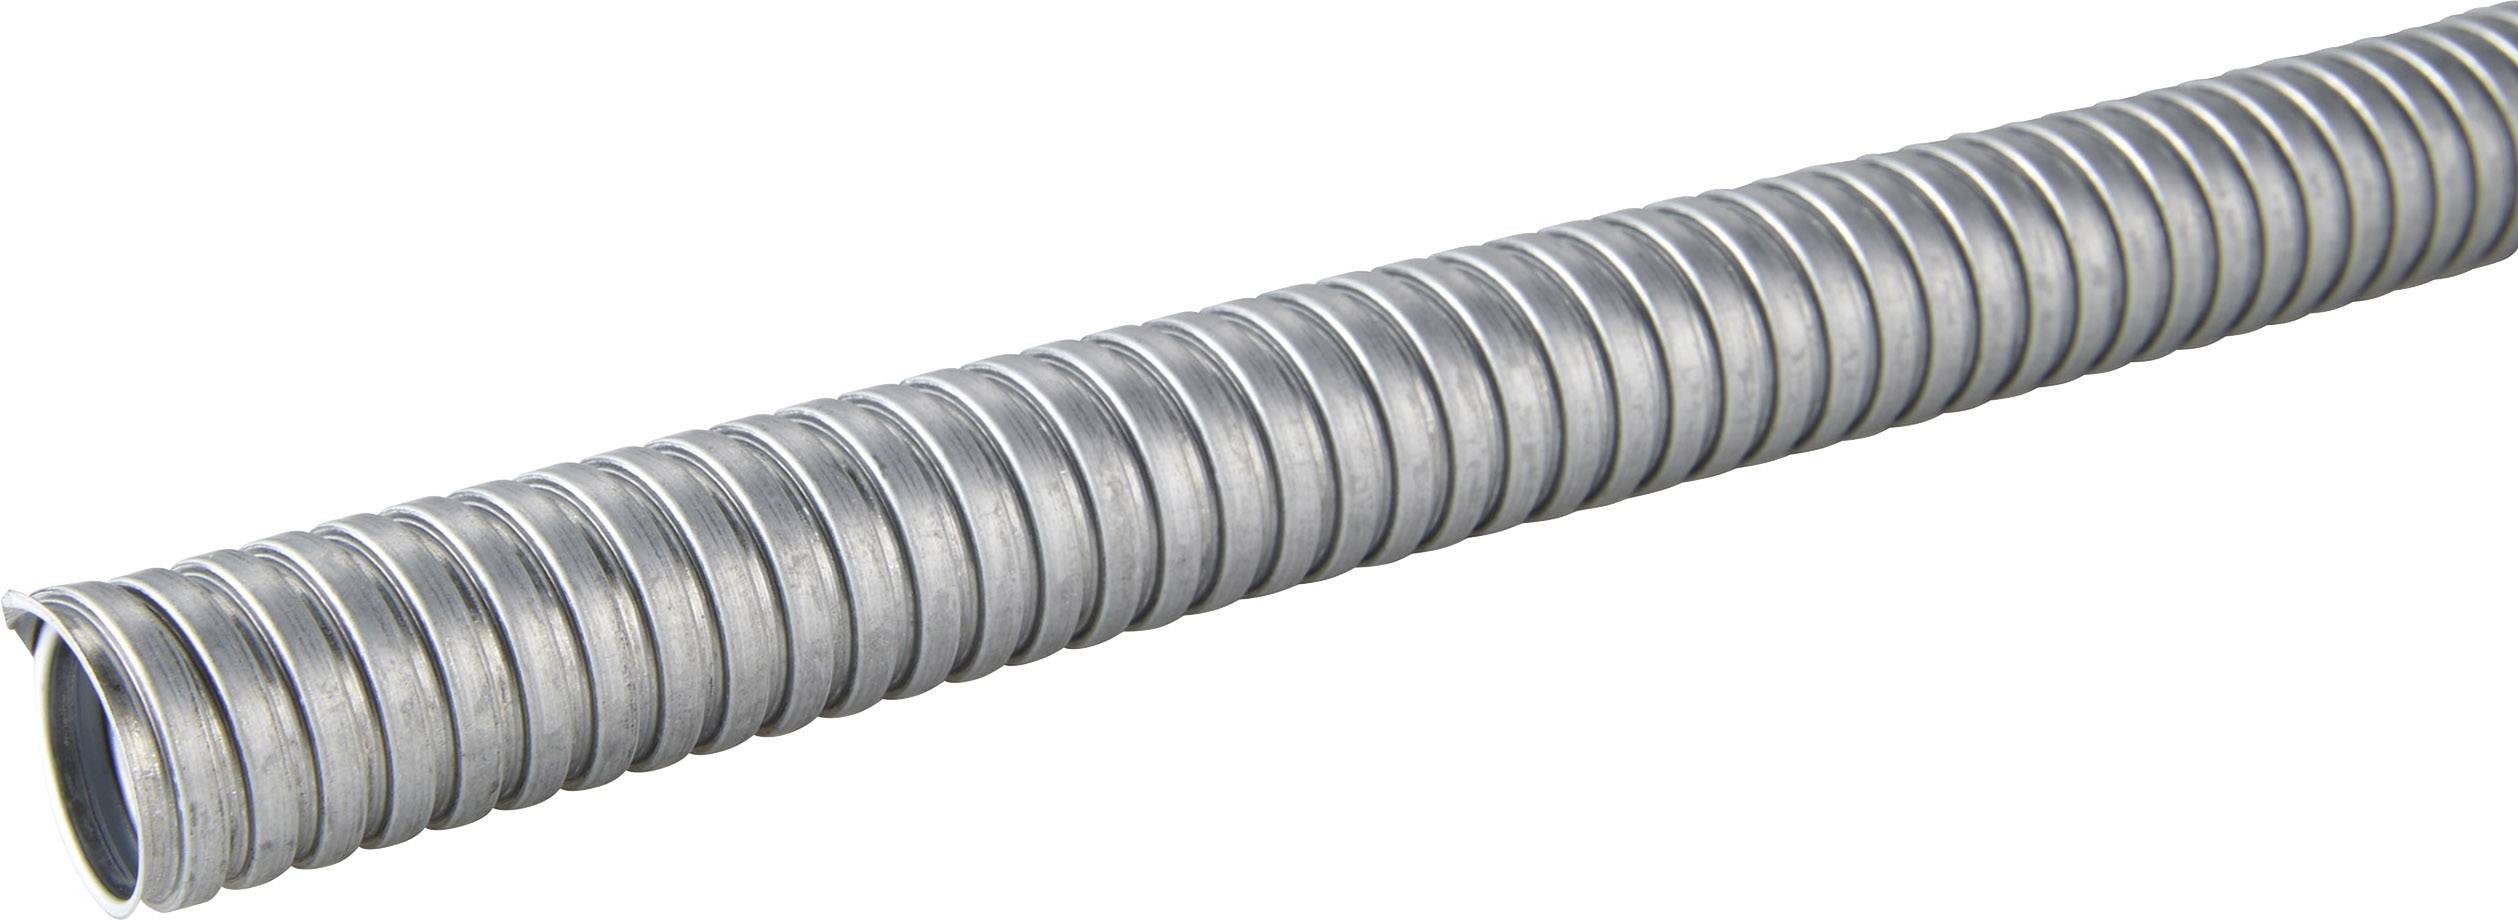 Ochranná hadice na kov LappKabel SILVYN® AS 13,5/16x19 61802110, stříbrná, 50 m